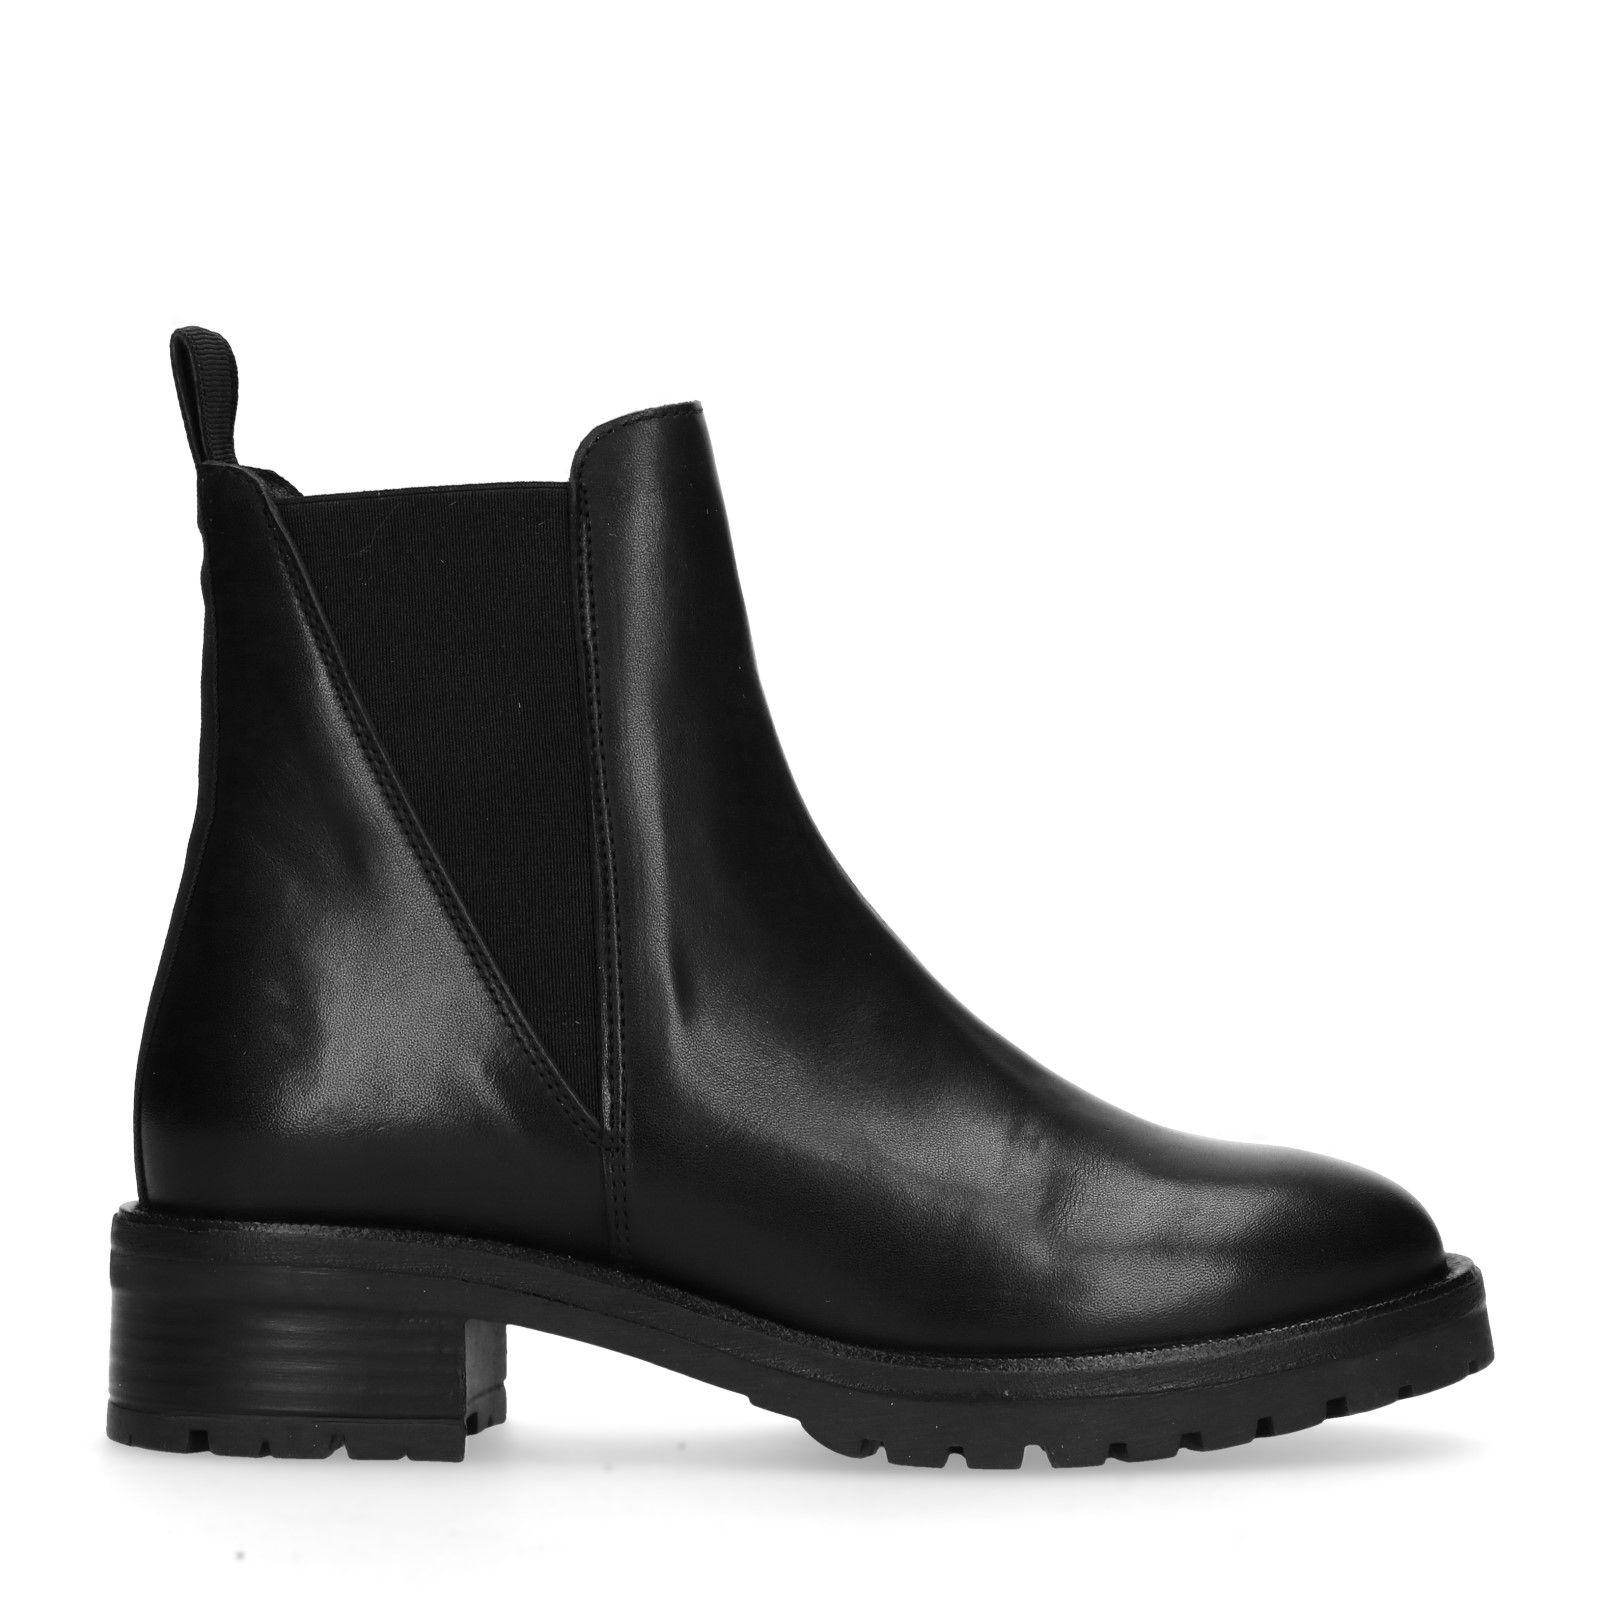 Sacha Chelsea En Cuir Noir Boots Kul1J3TFc